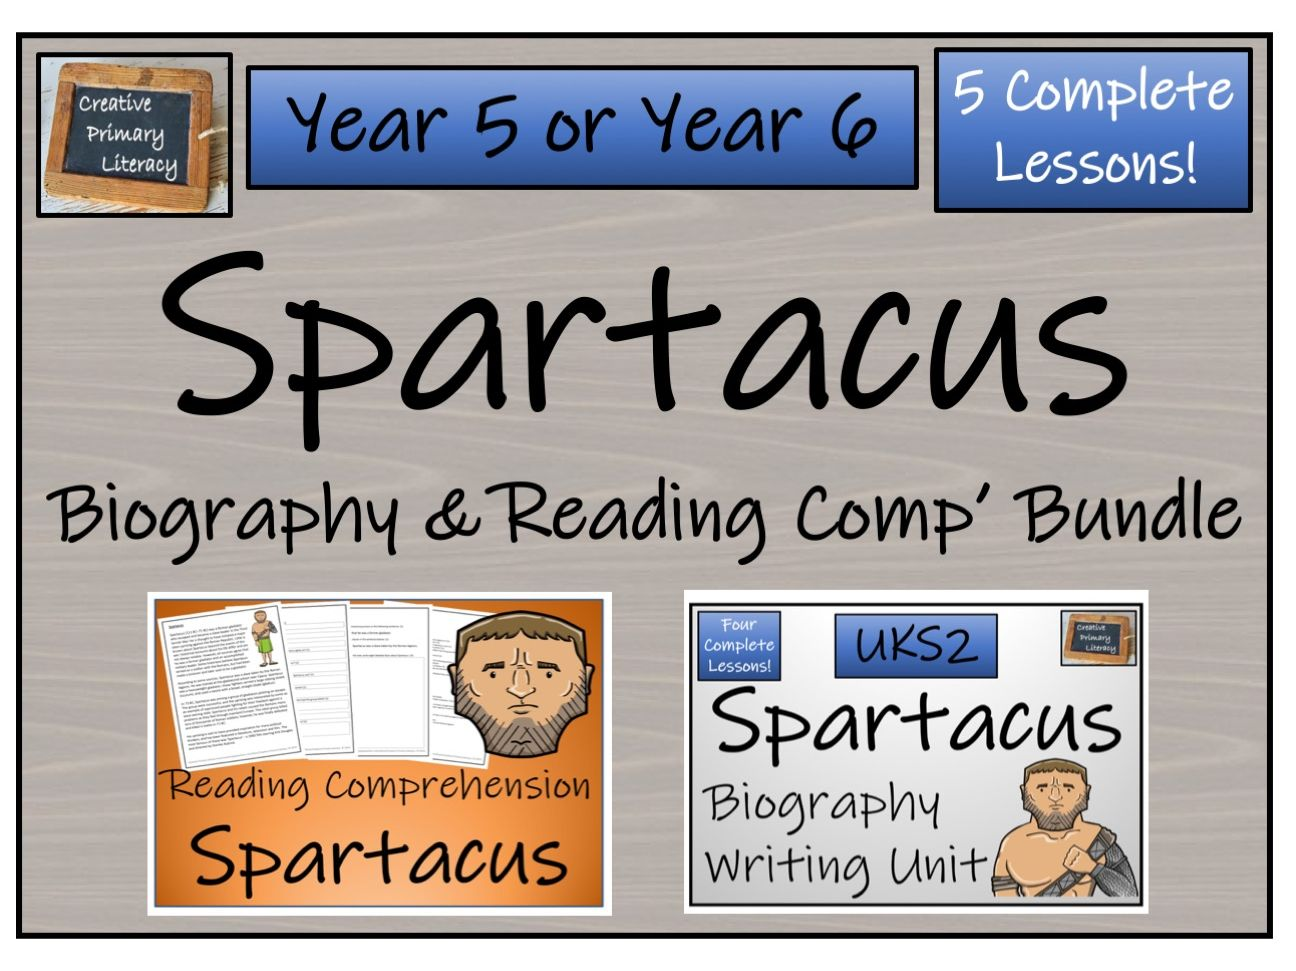 UKS2 History - Spartacus Reading Comprehension & Biography Bundle